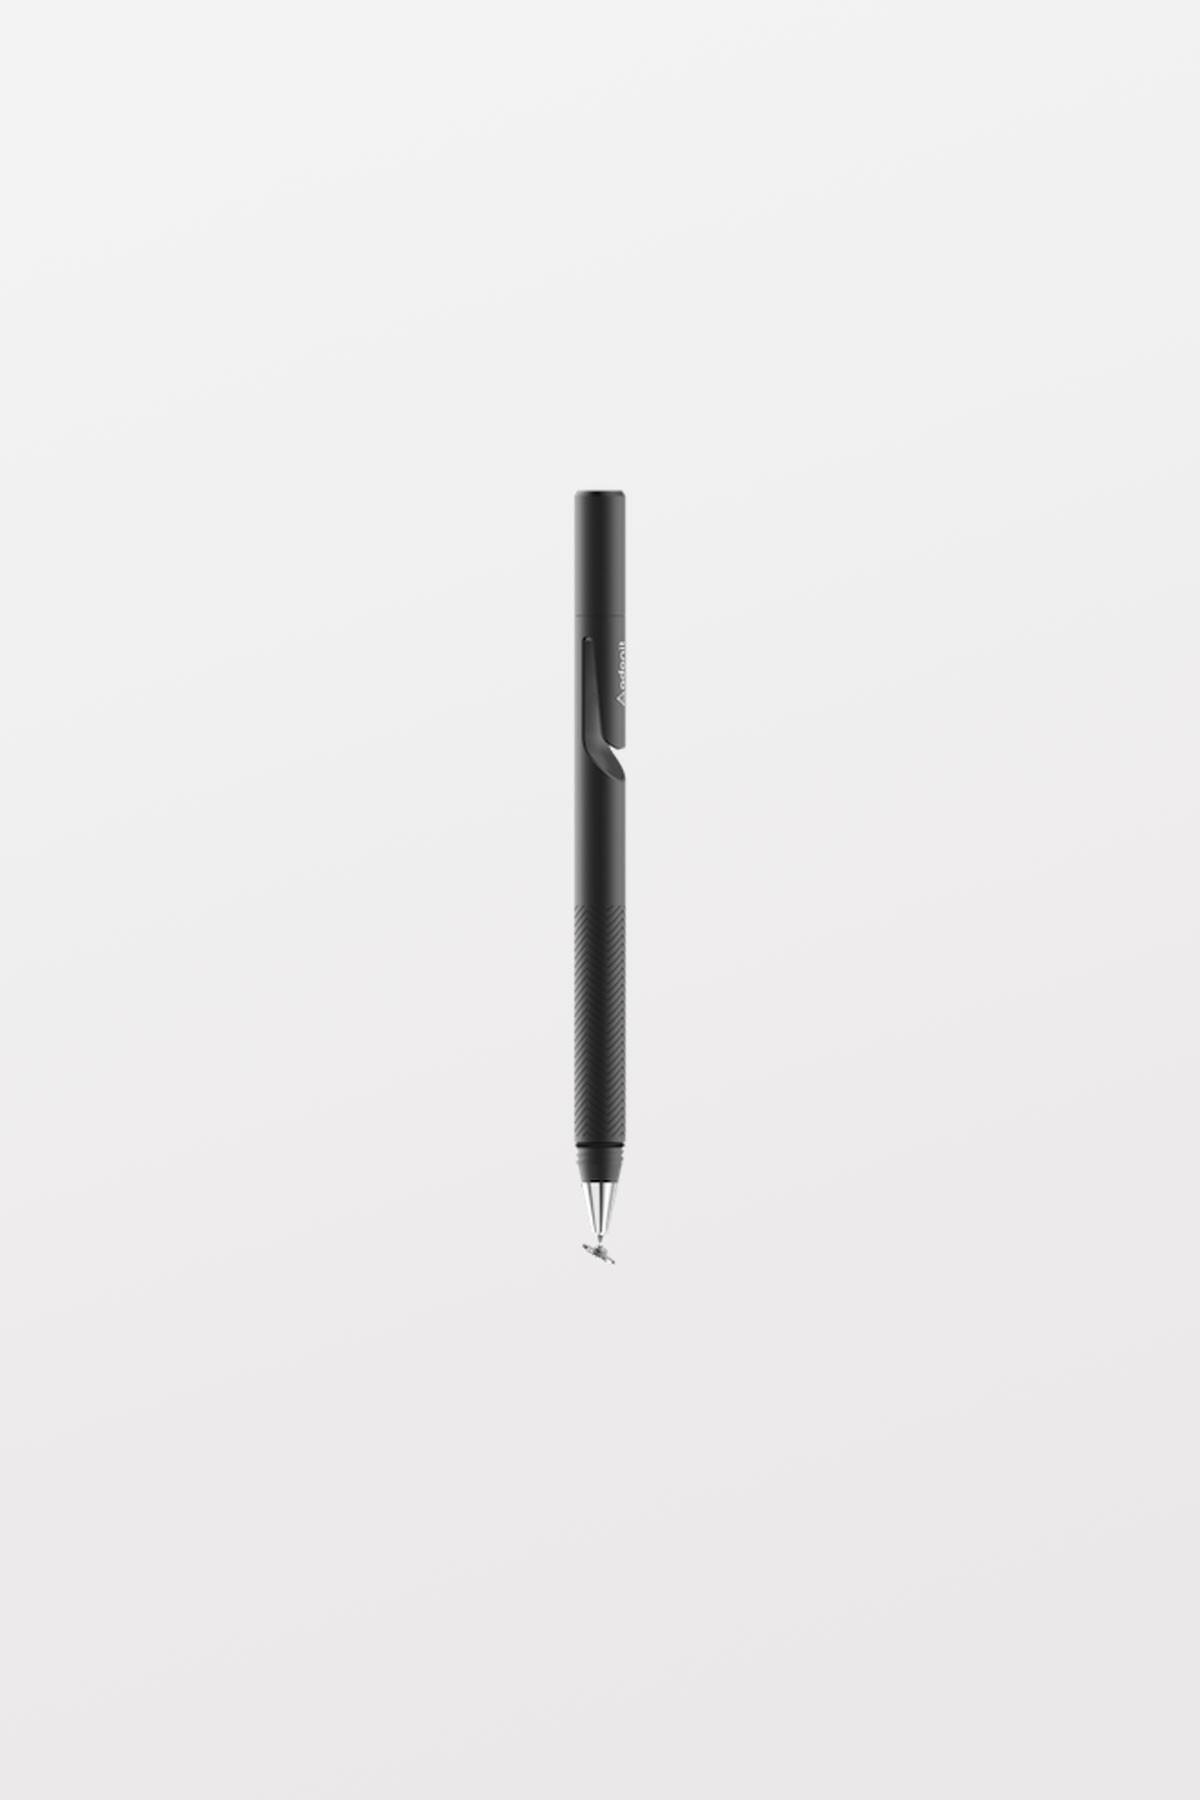 Adonit Jot Pro Stylus for iPad - Black